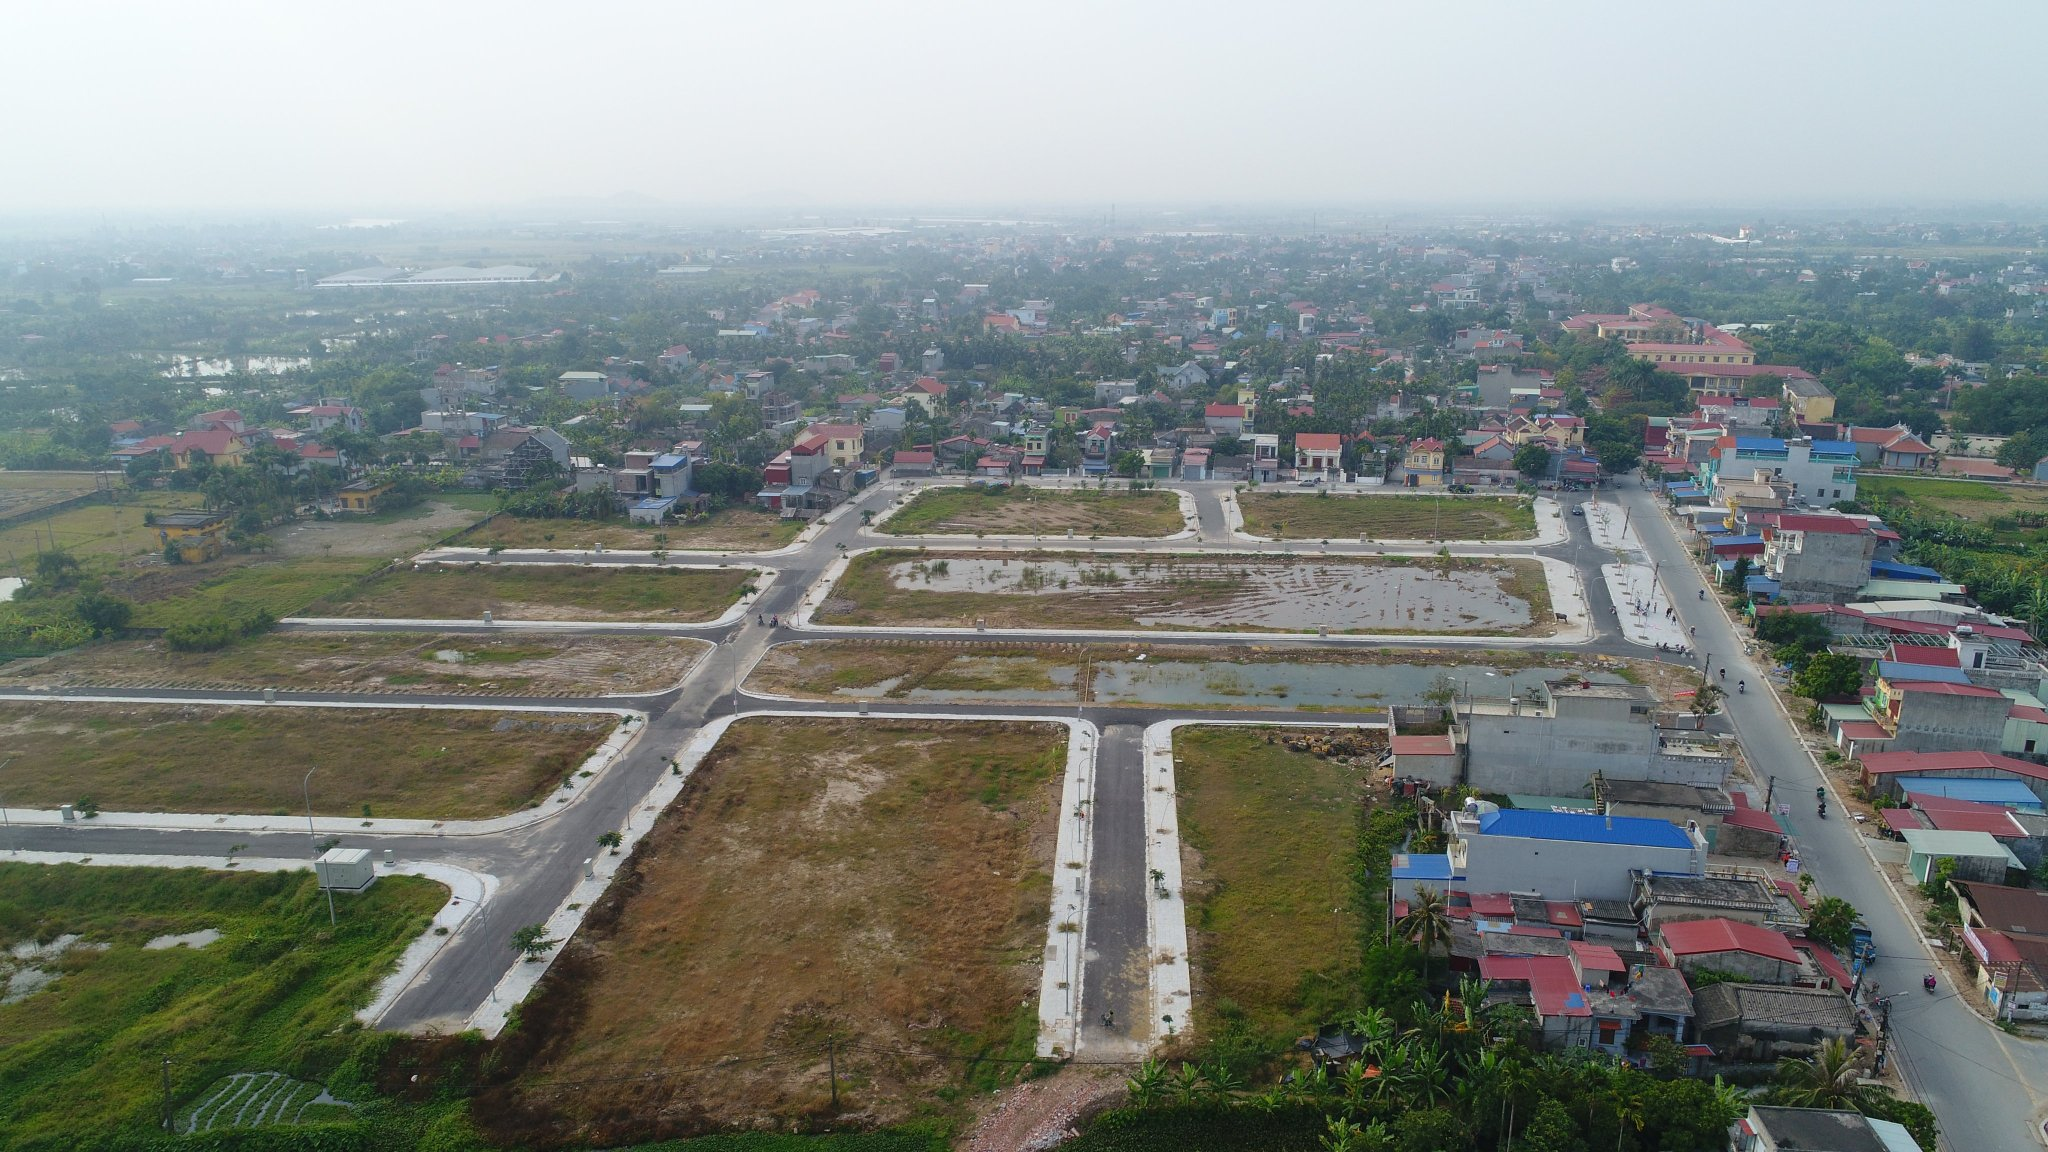 da-phuc-central-park4